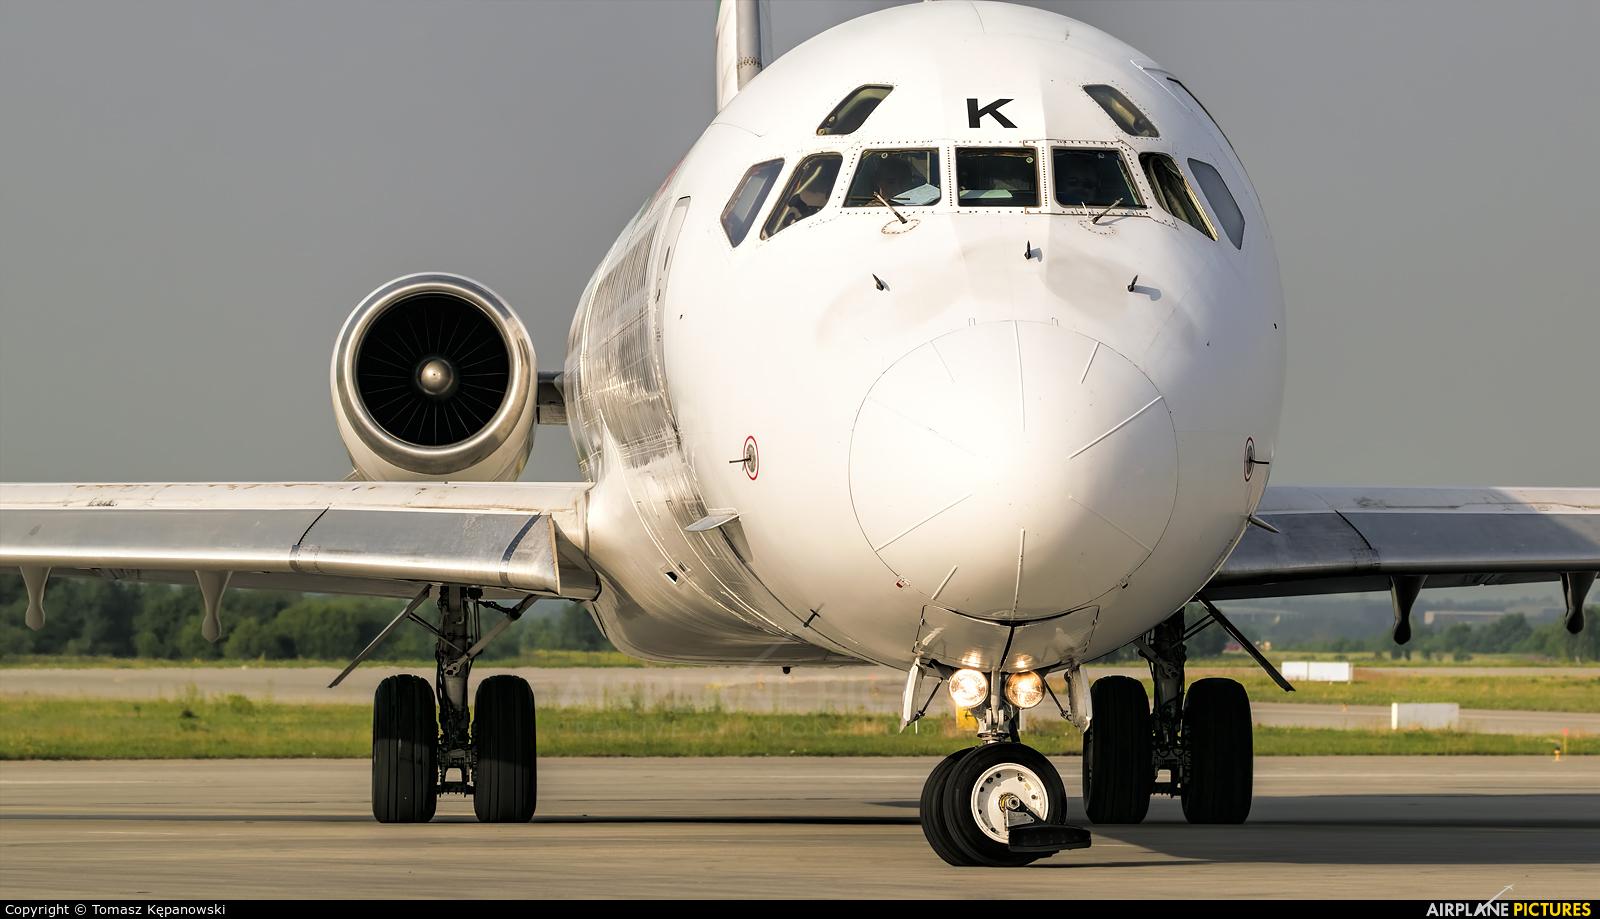 Bulgarian Air Charter LZ-LDK aircraft at Rzeszów-Jasionka